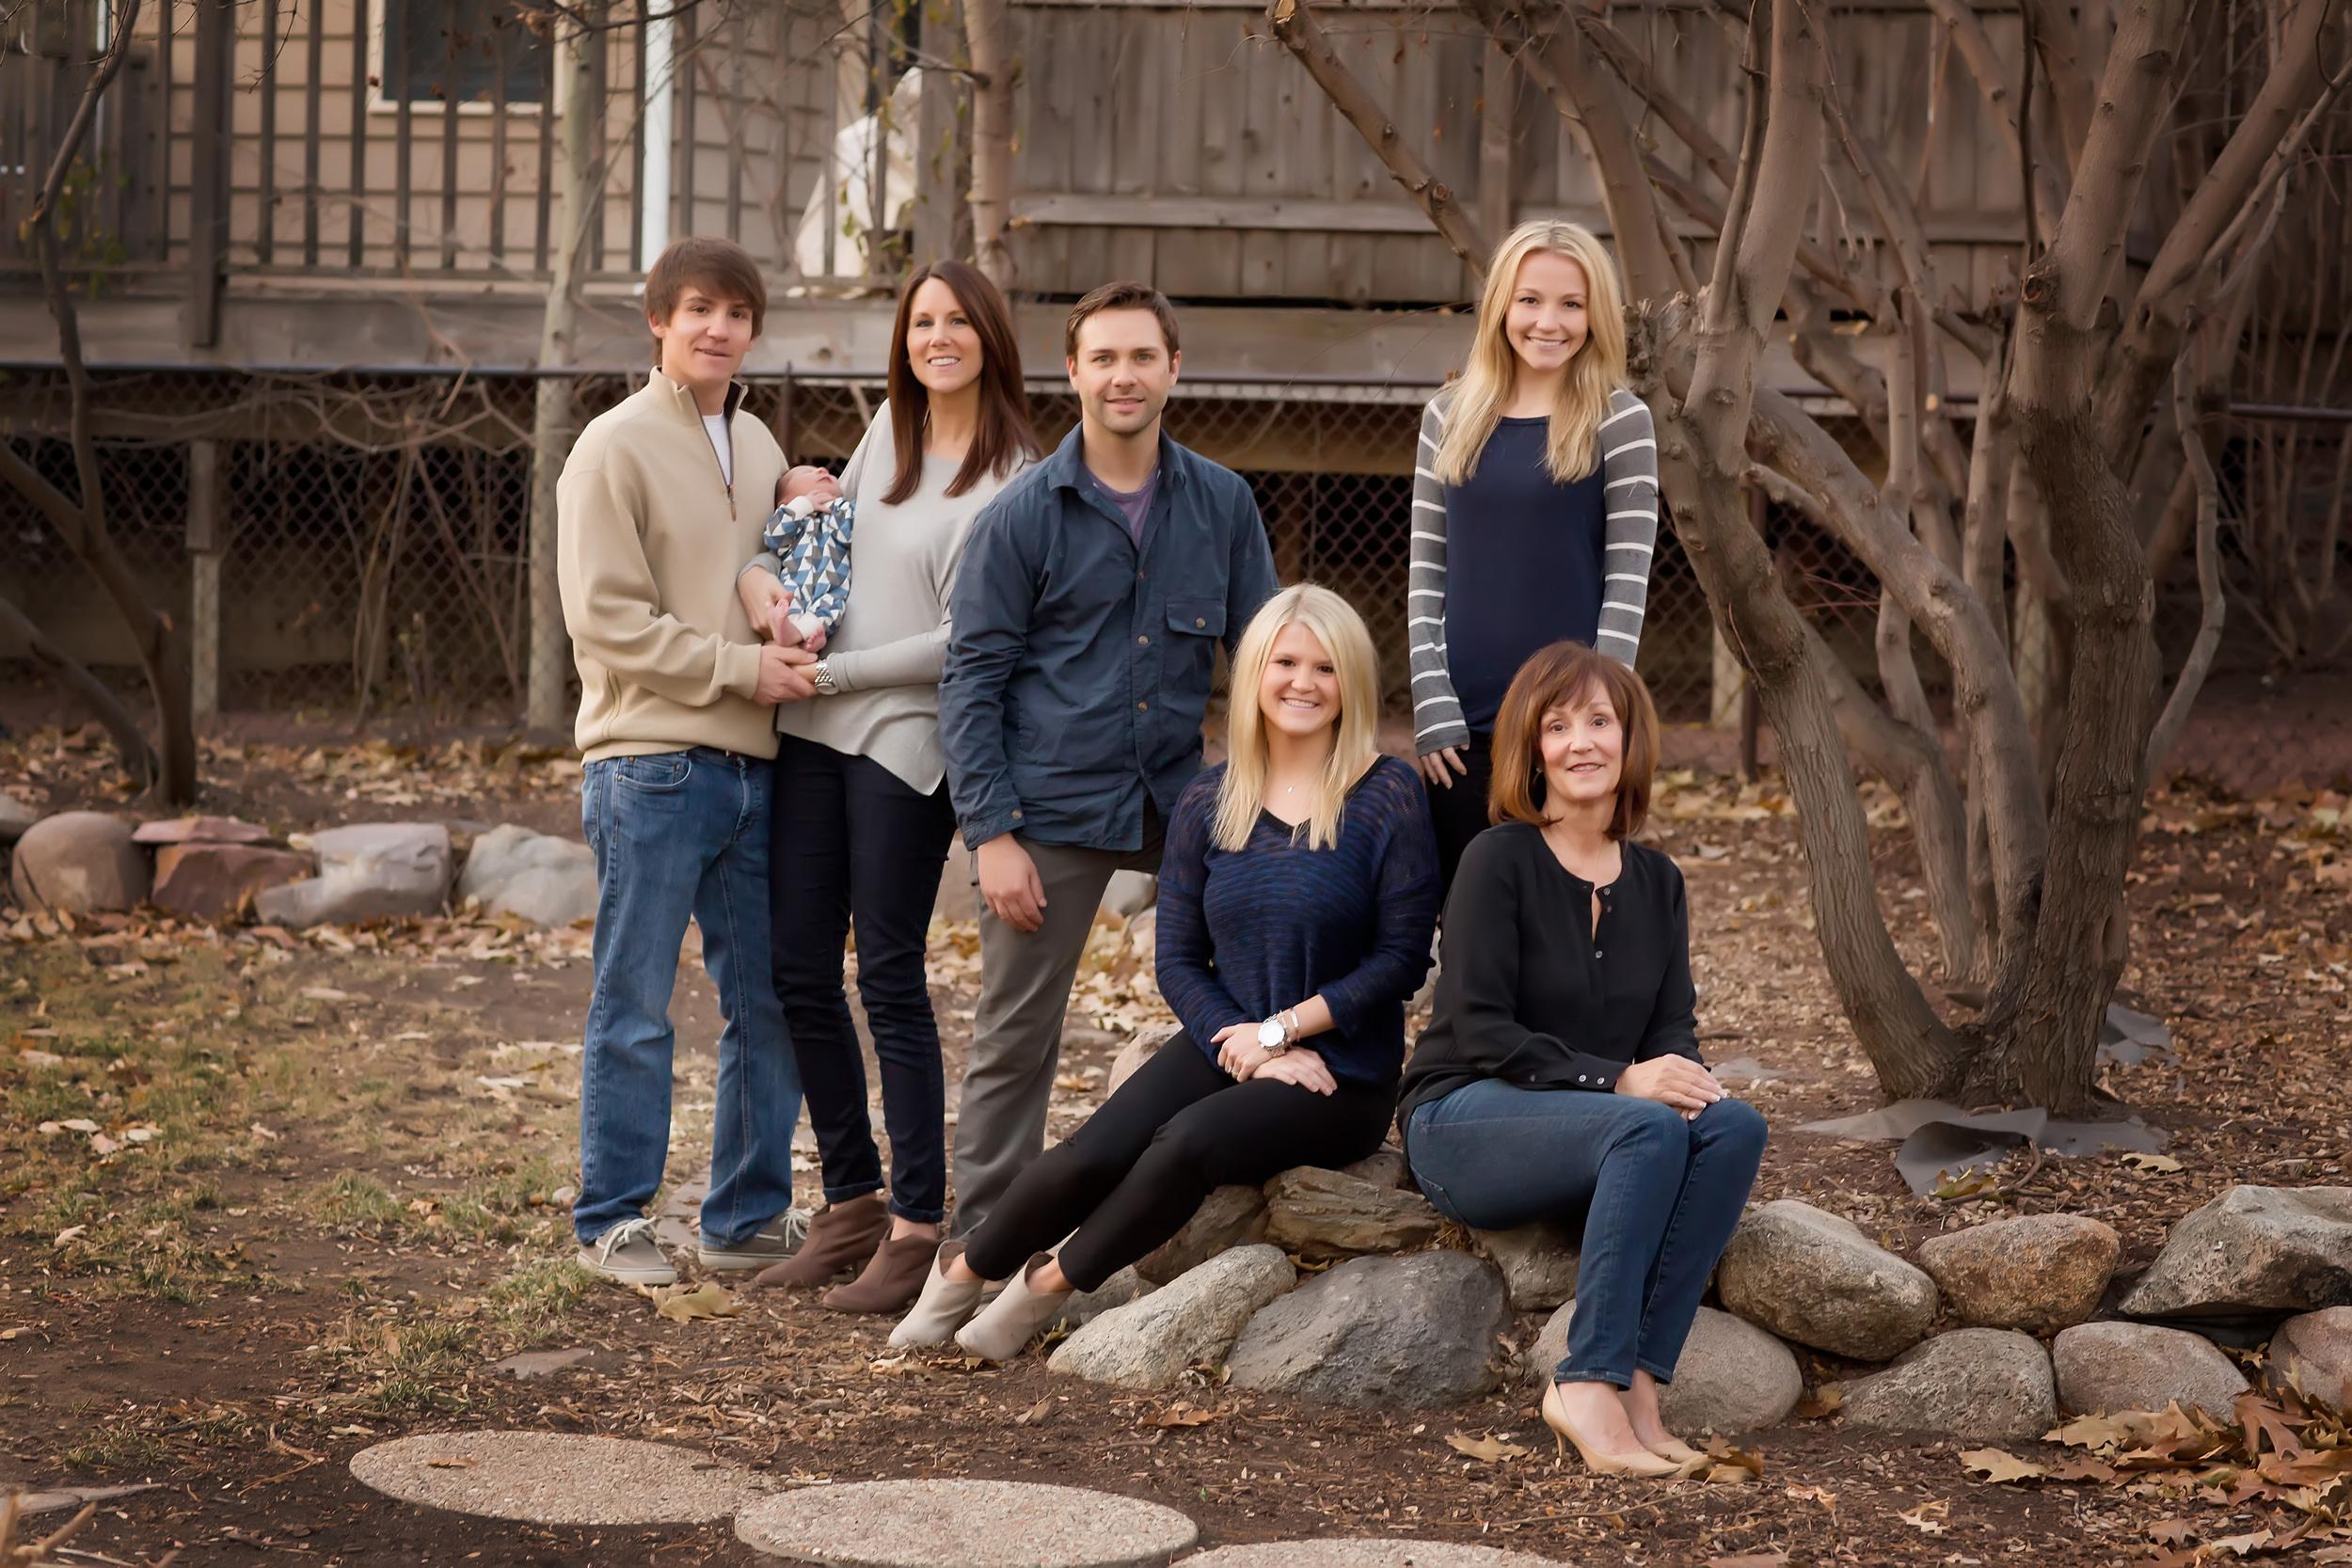 family_portrait_sioux_falls_Shalista0041.jpg